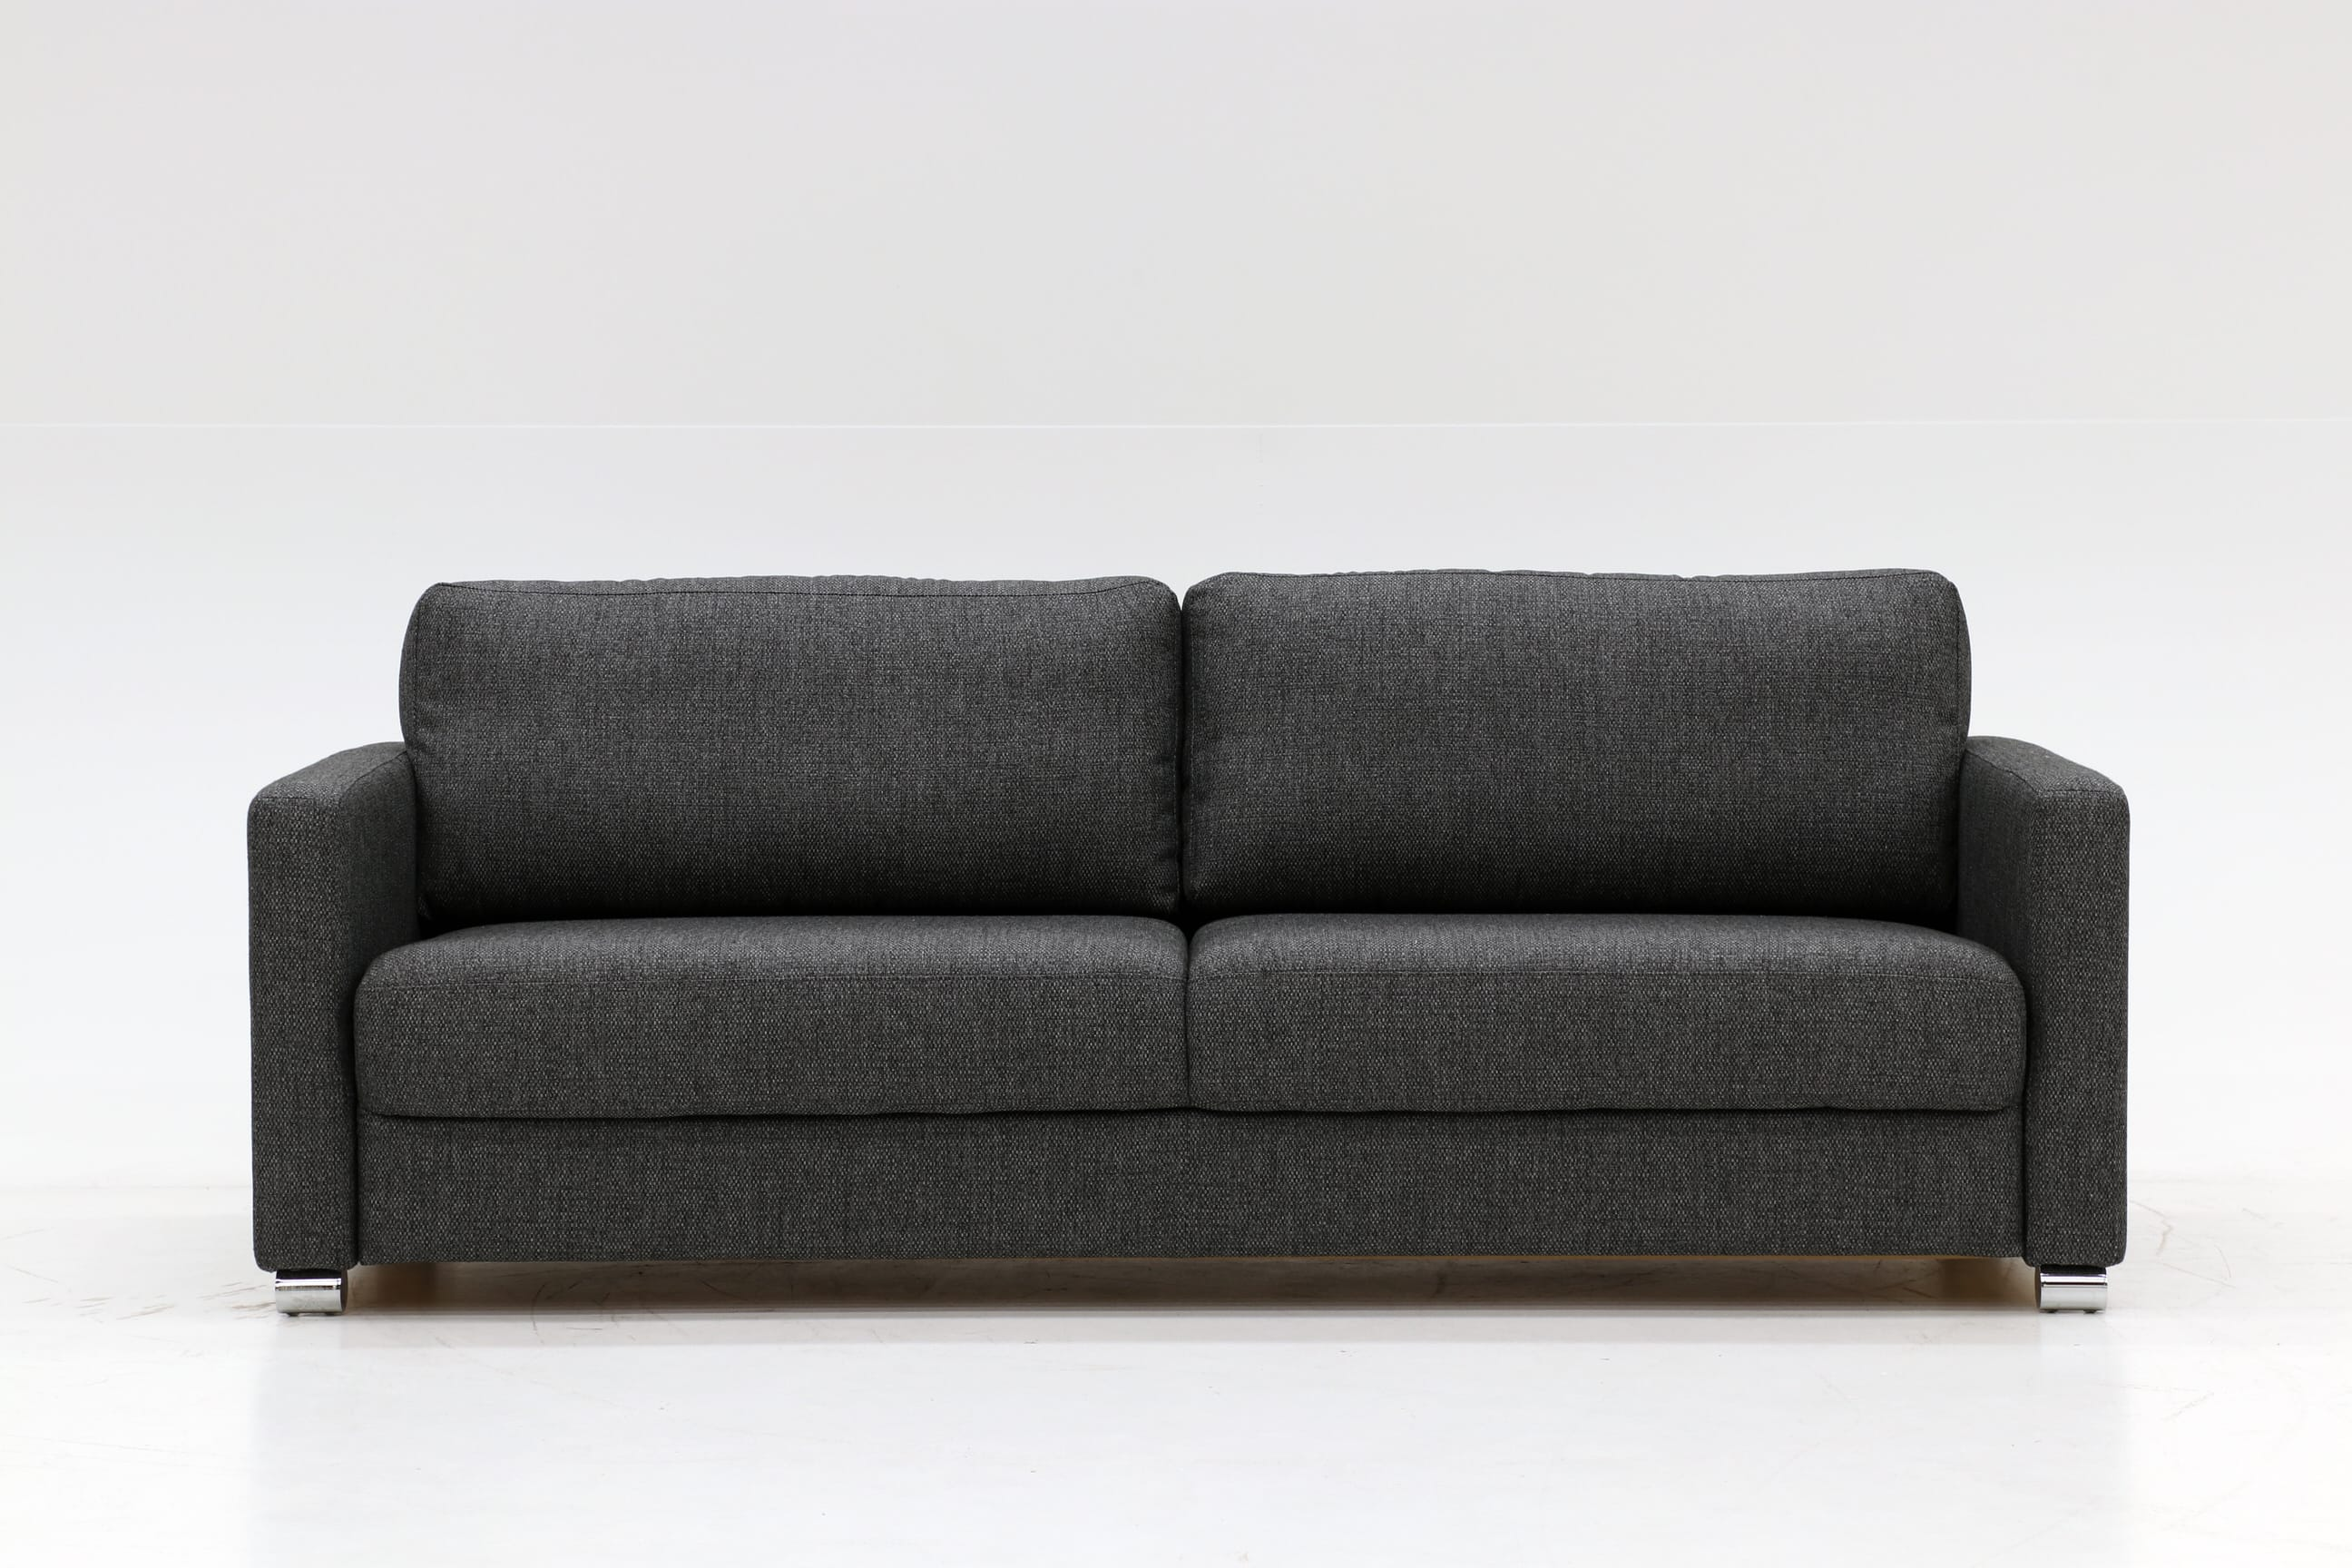 Remarkable Fantasy Sofa Sleeper Full Xl Size By Luonto Furniture Spiritservingveterans Wood Chair Design Ideas Spiritservingveteransorg